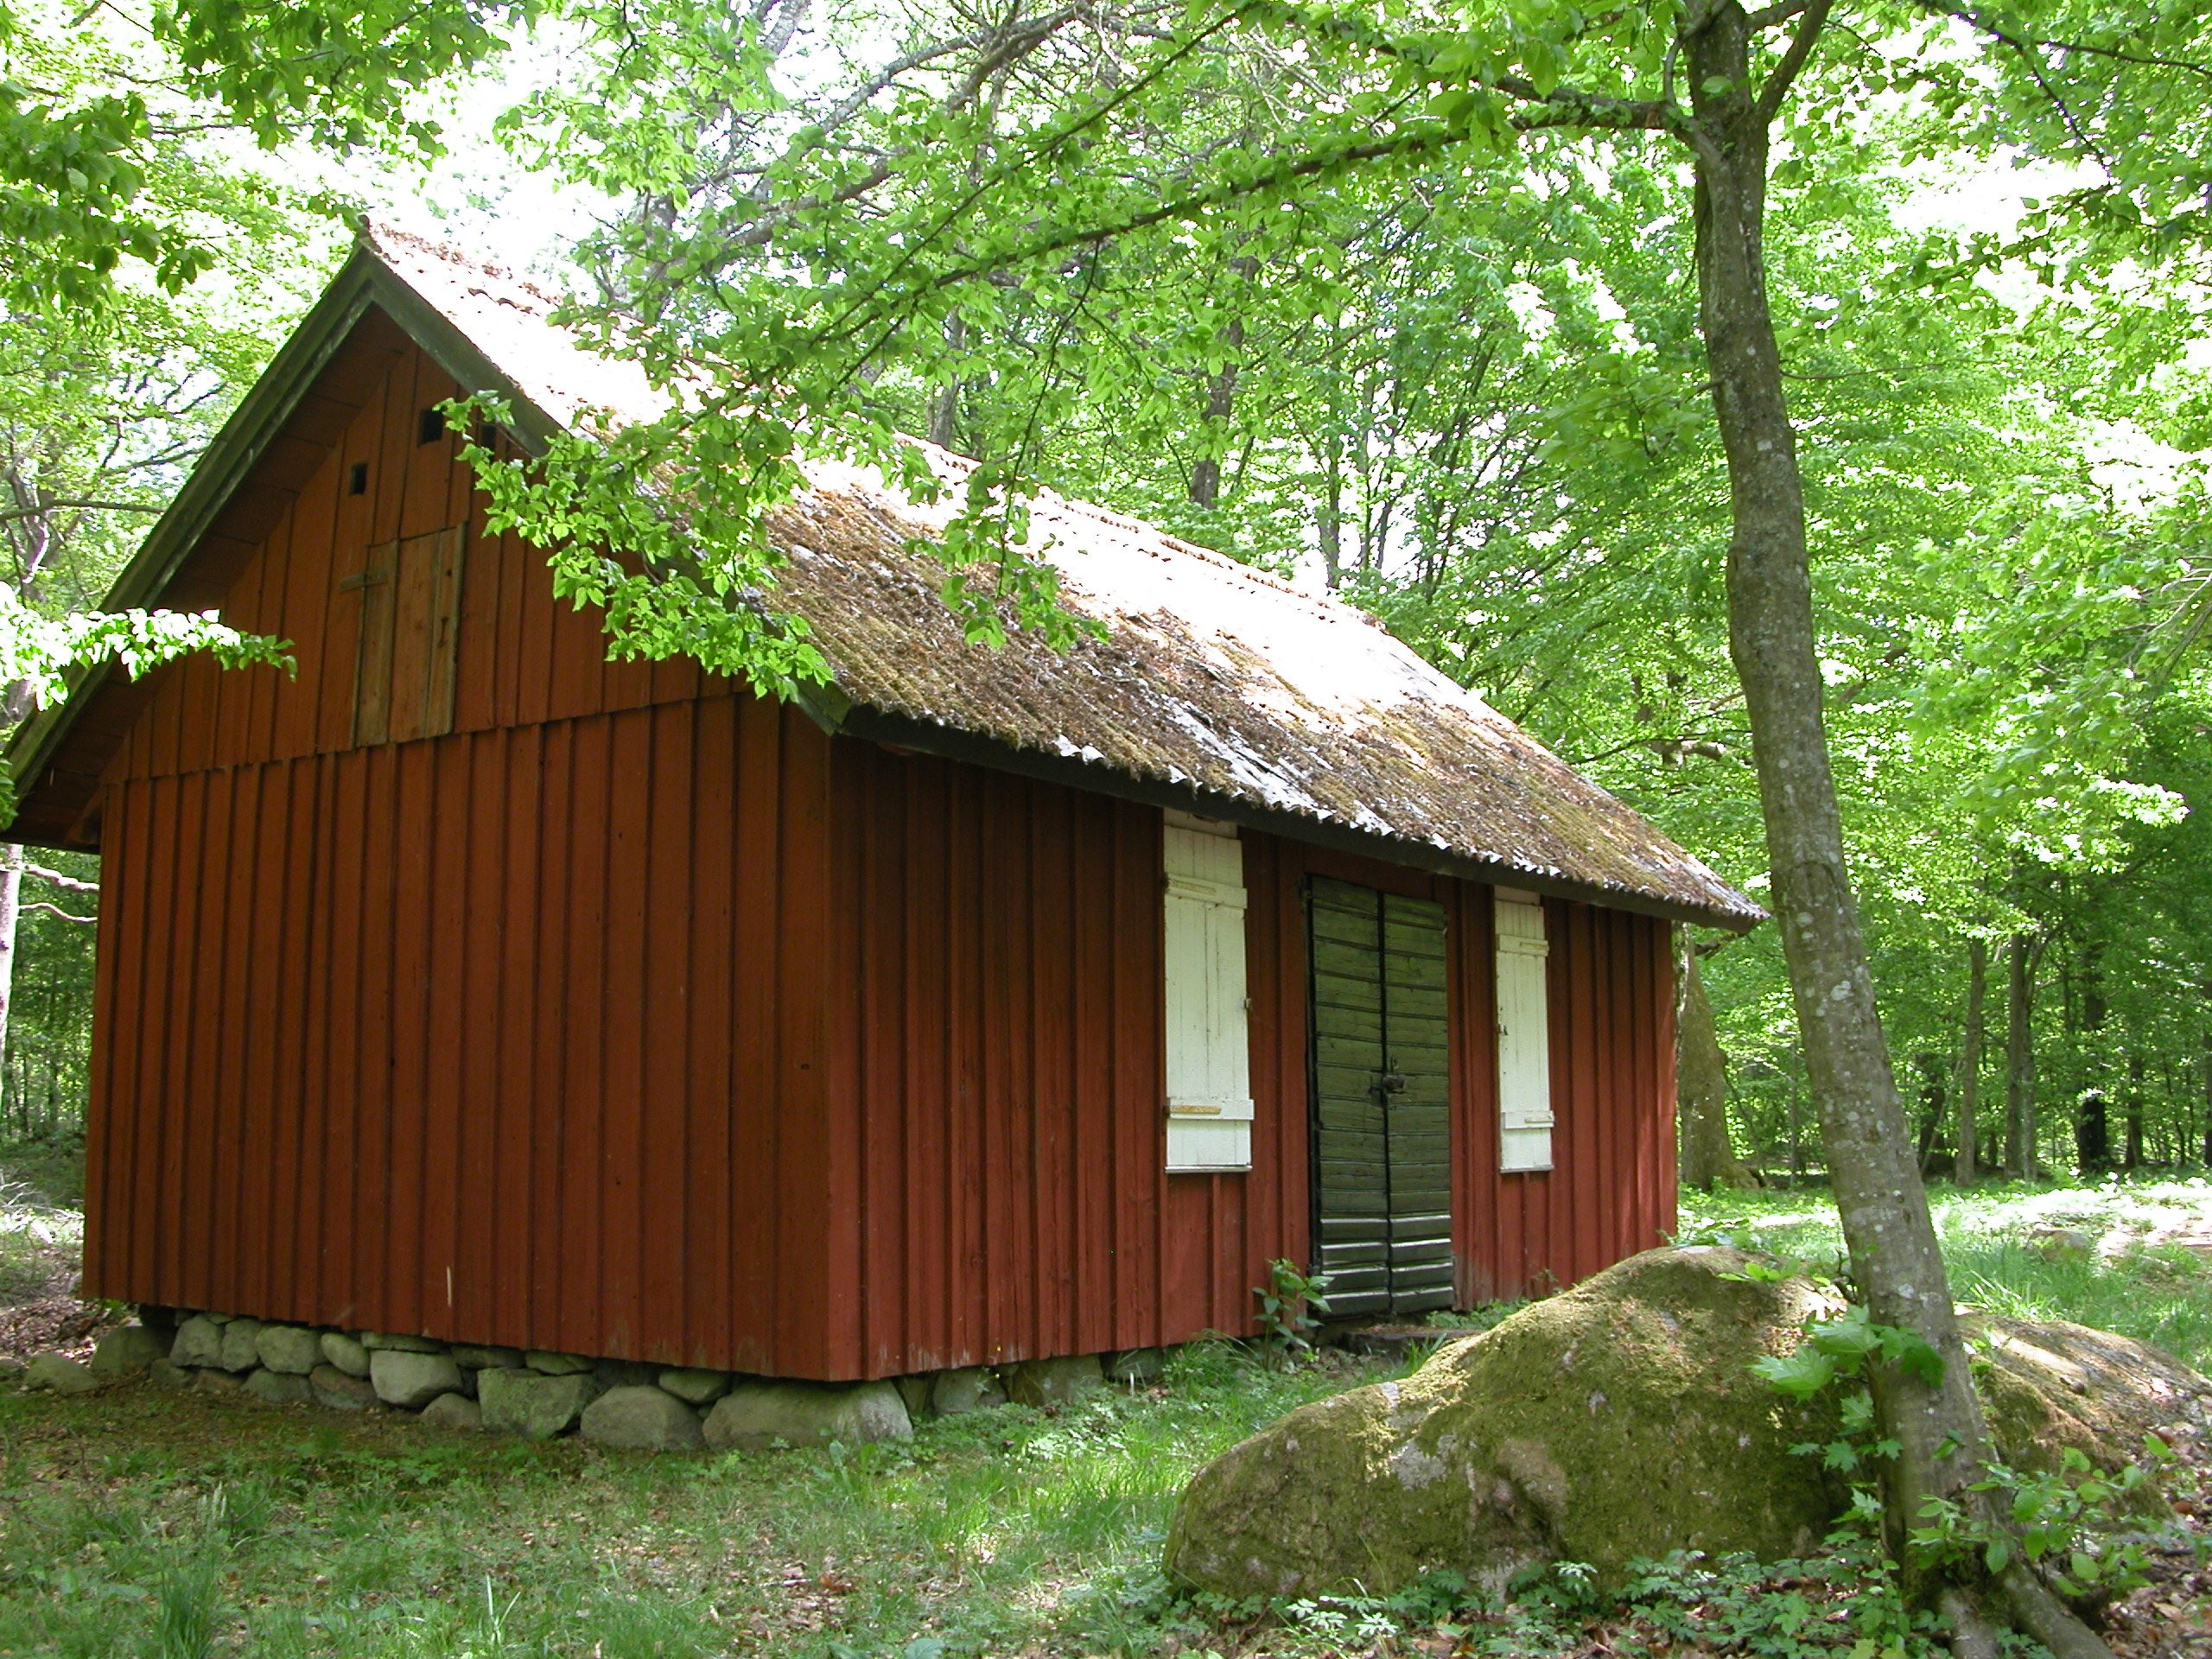 Heimatsmuseum Älmhult und Ormakullagården